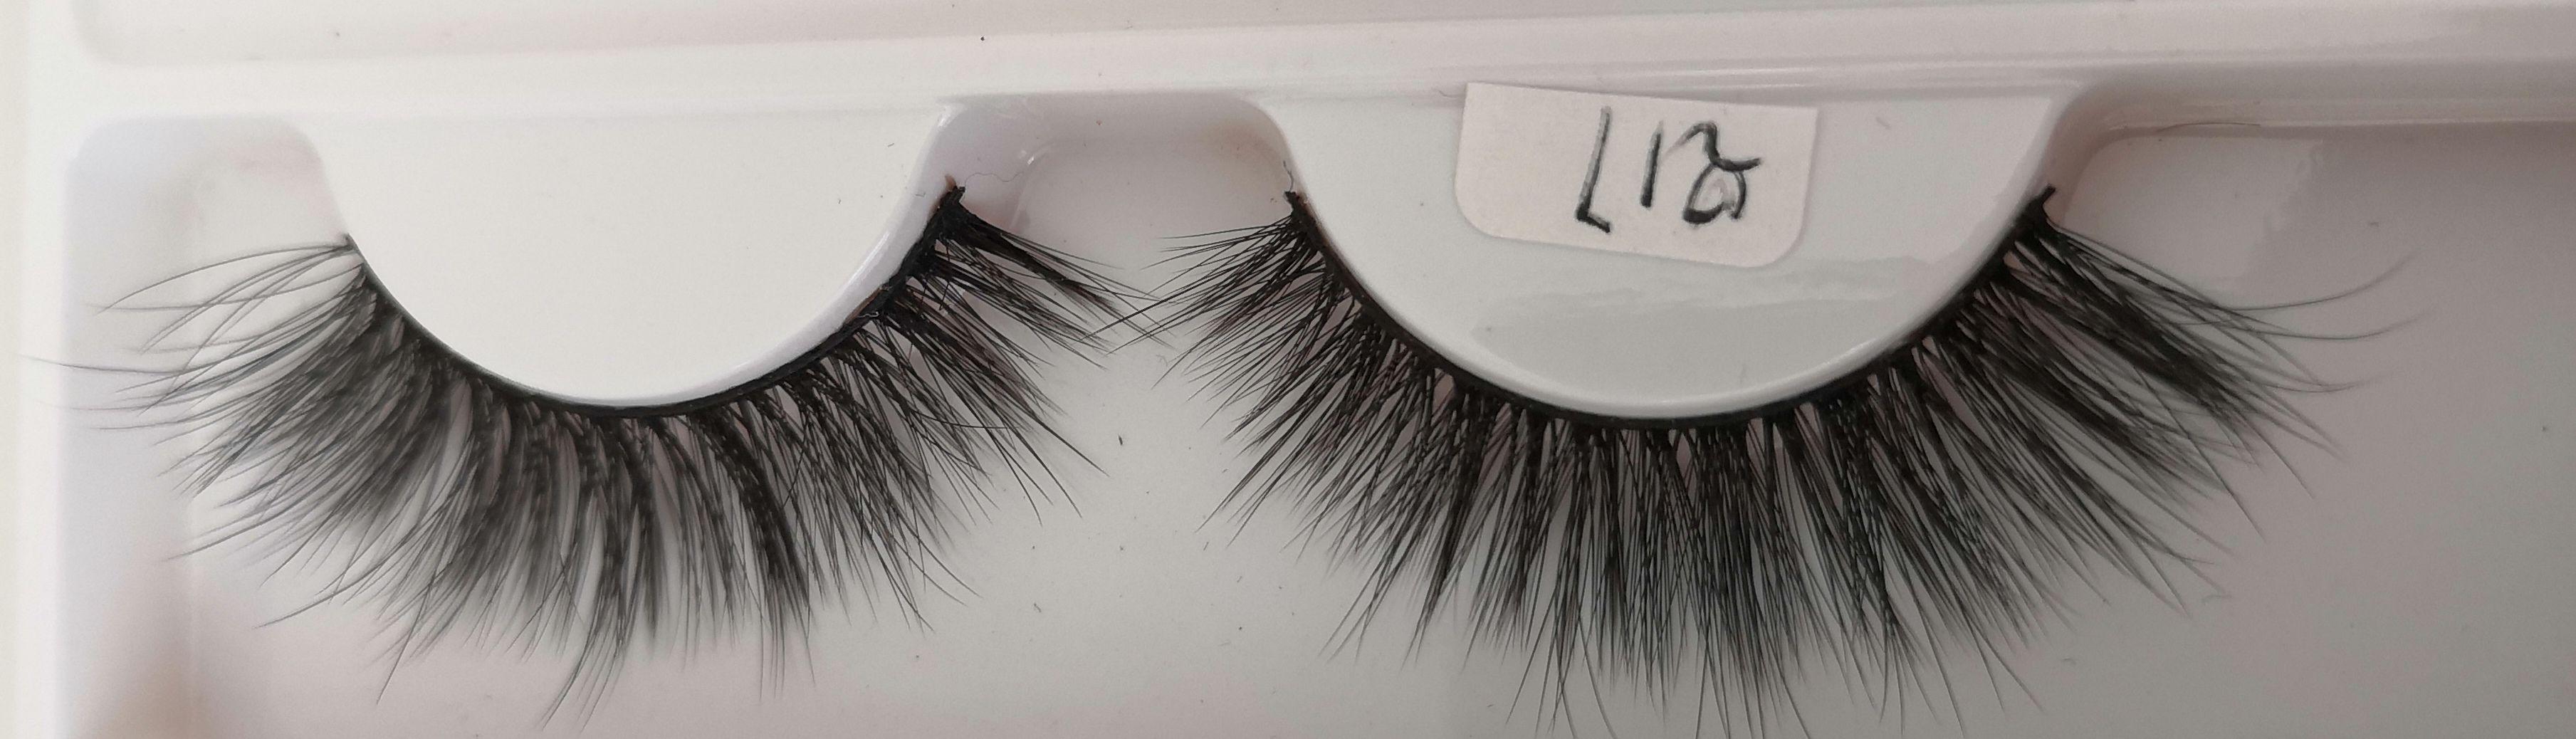 Q17 False eyelashes 3D chemical fiber 0.07 soft natural realistic custom brand custom packaging handmade wholesaler